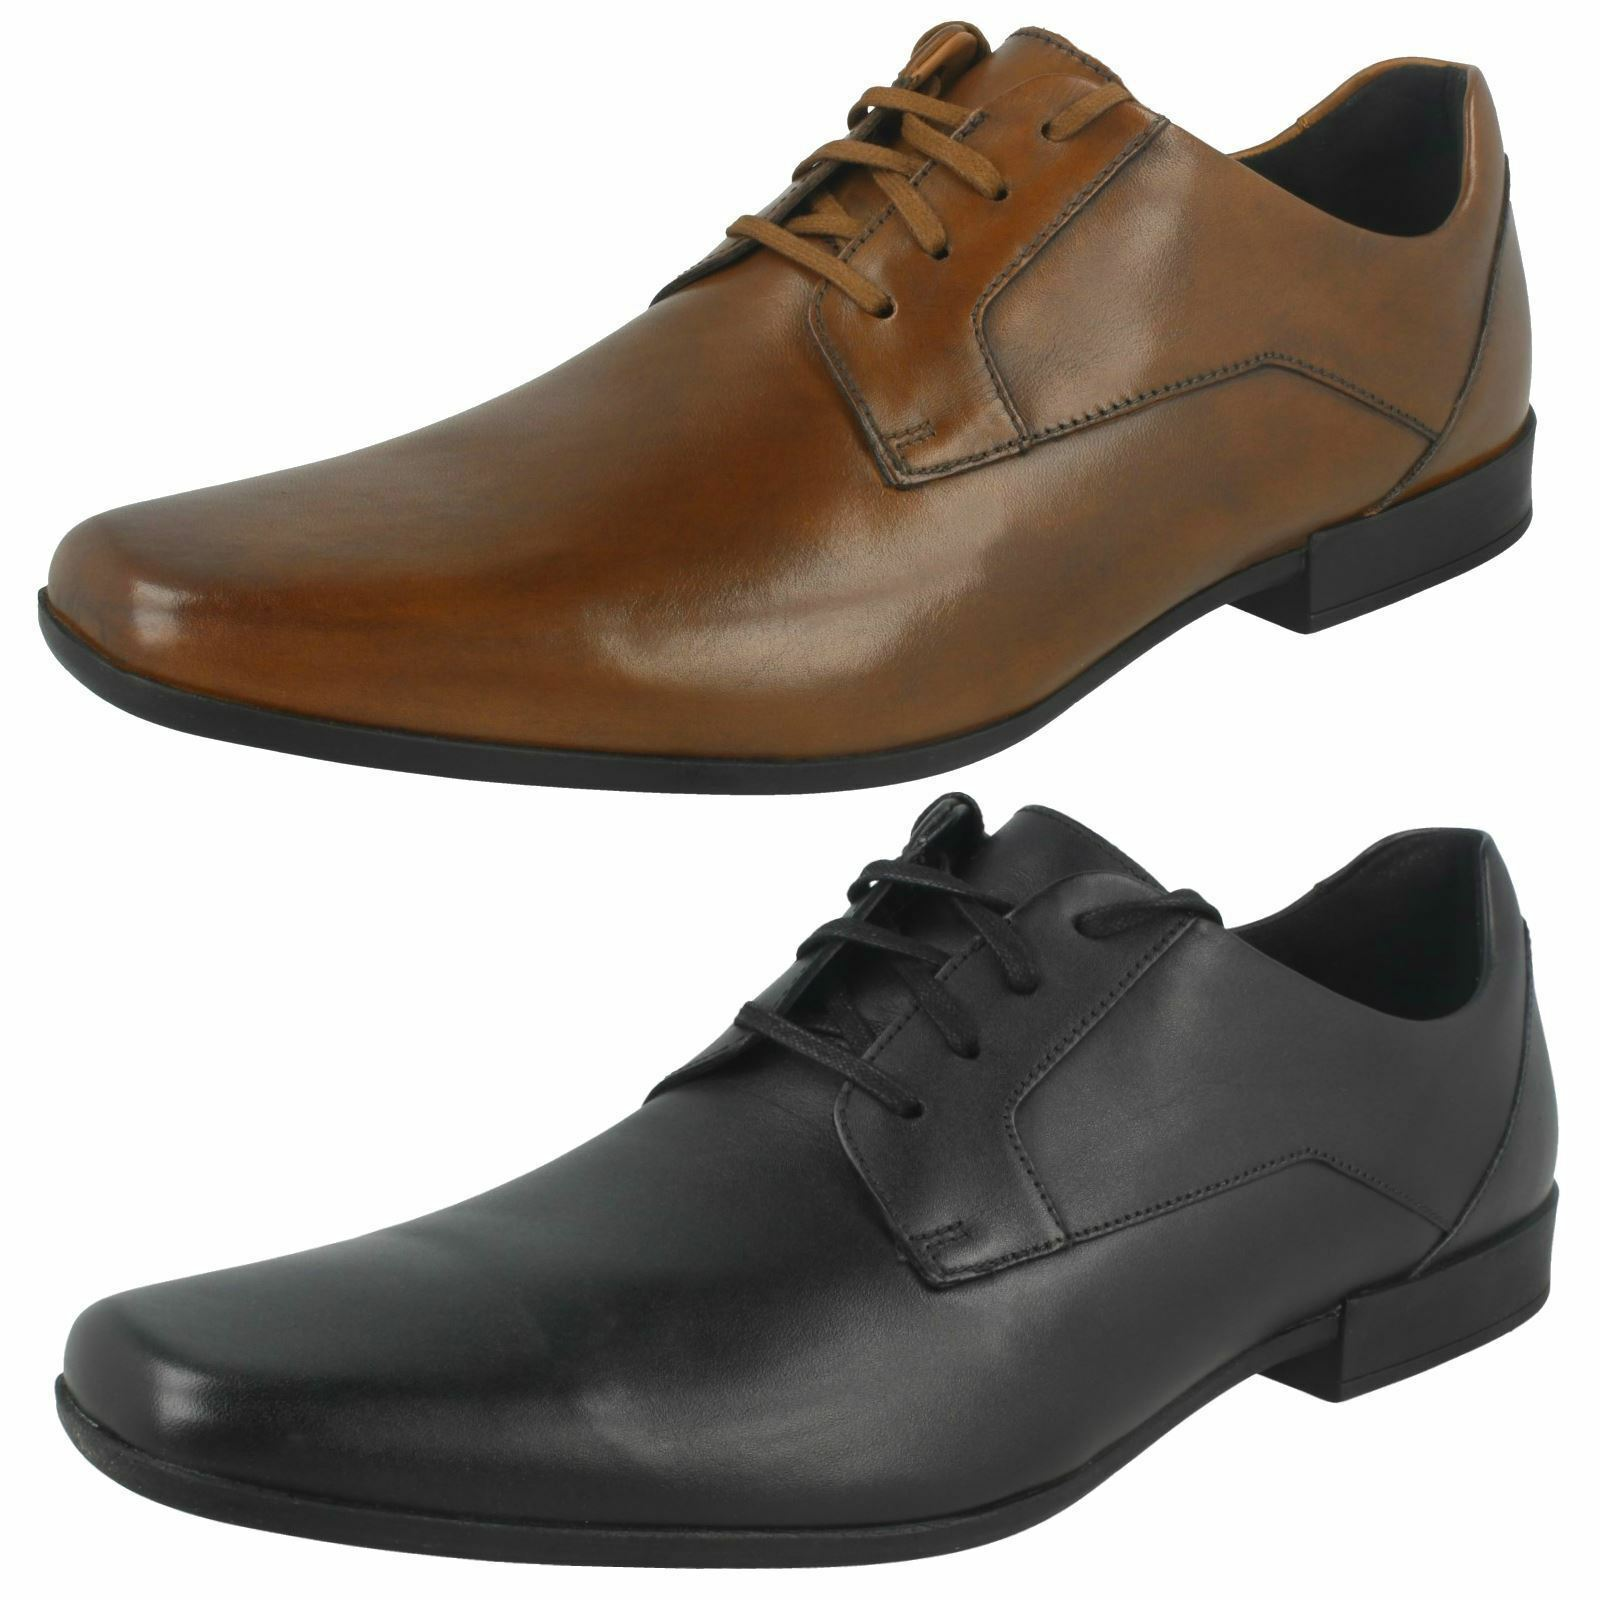 Herren Clarks Schnürer Leder Elegante Büro Arbeit Party Schuhe Glement Spitze    | Feinbearbeitung